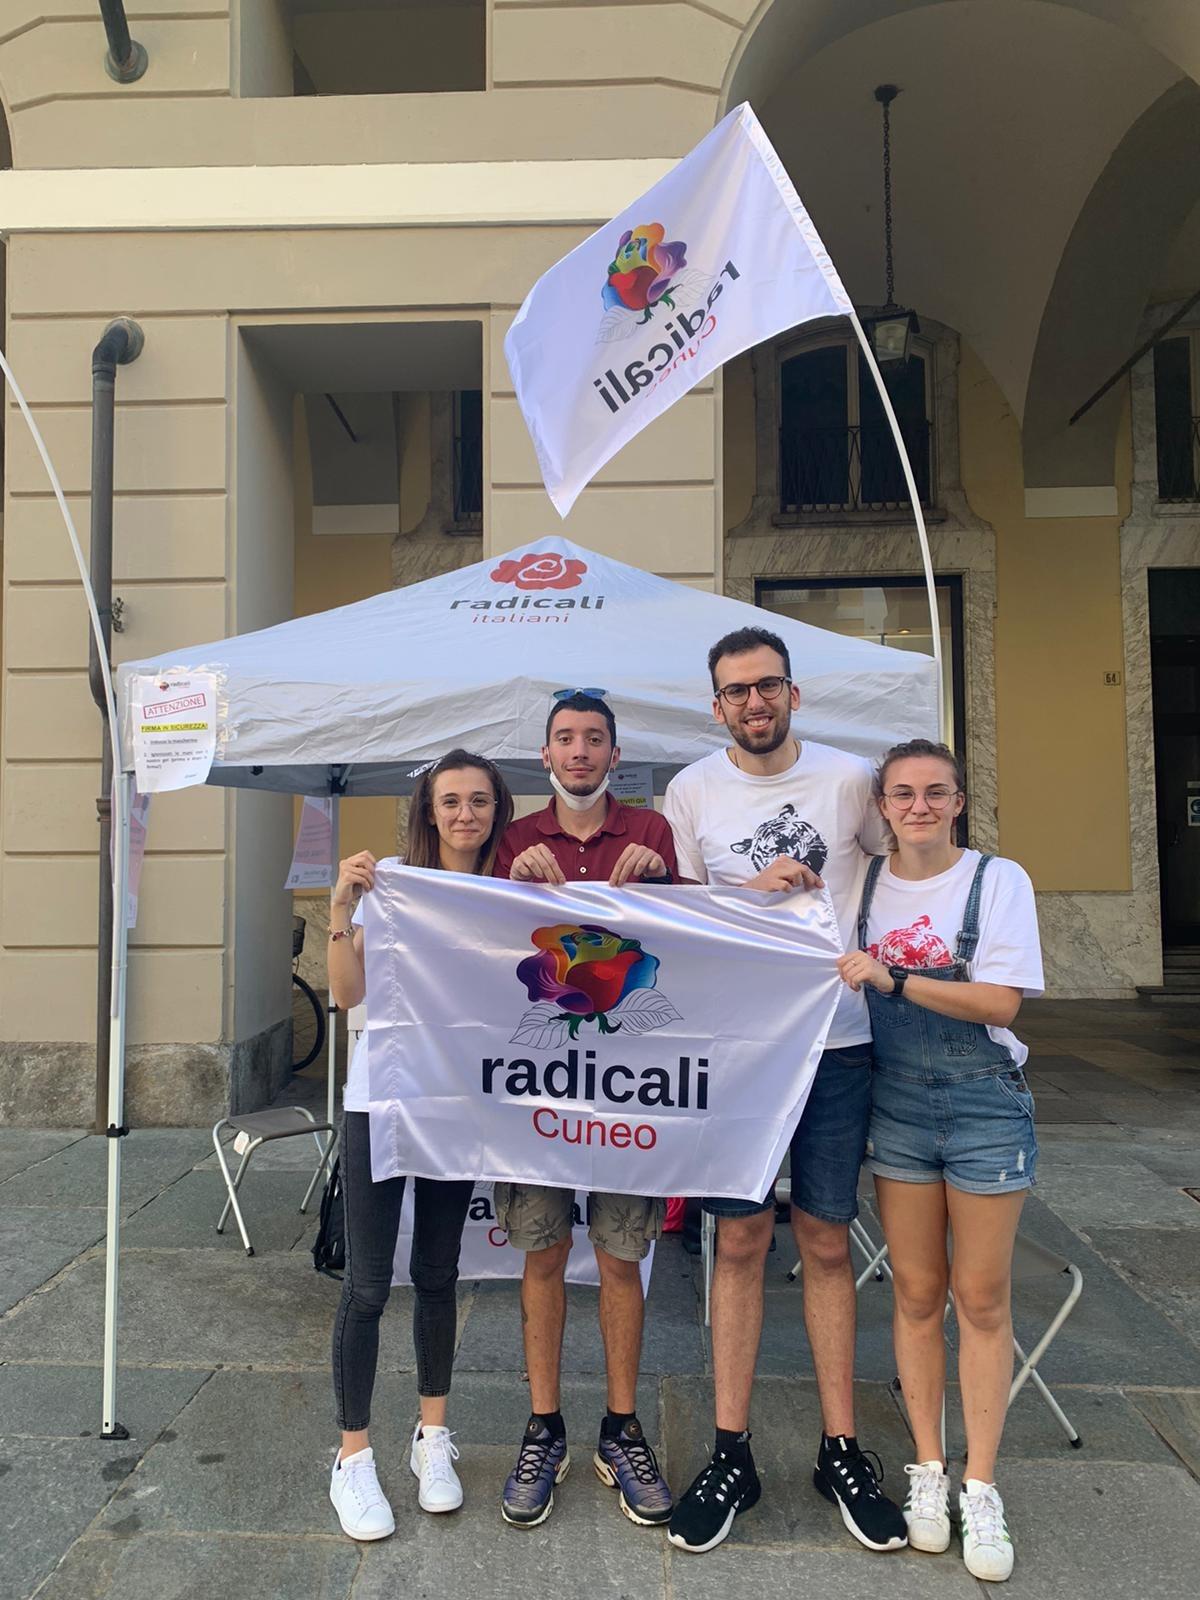 Anche l'UAAR aderisce alla campagna #Cuneolaica